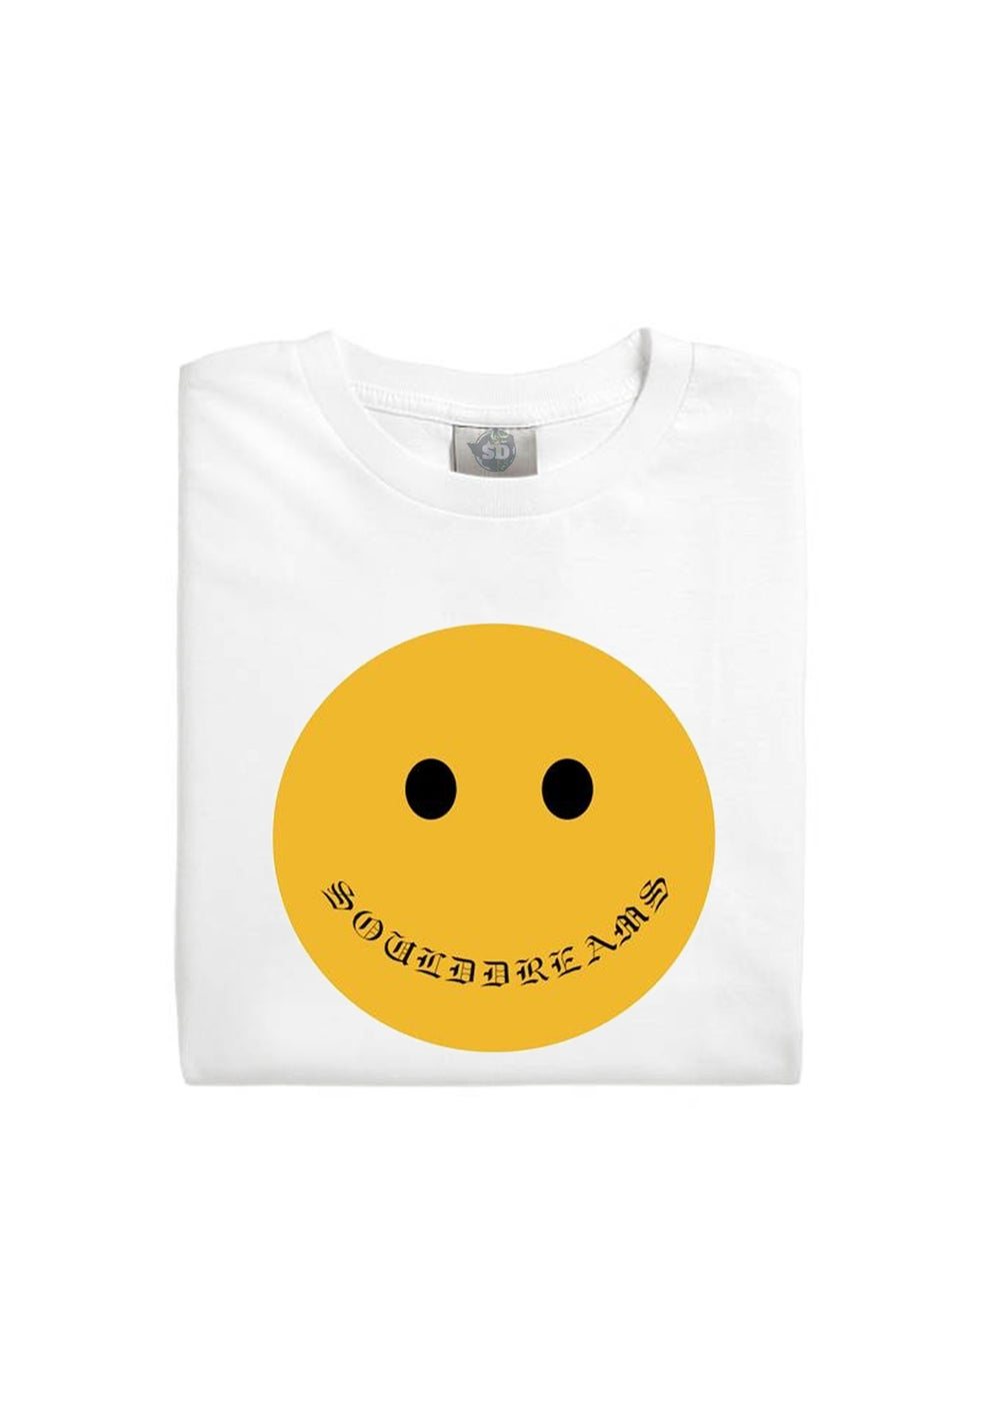 Image of Soul'd Dreams Smiley Tshirt